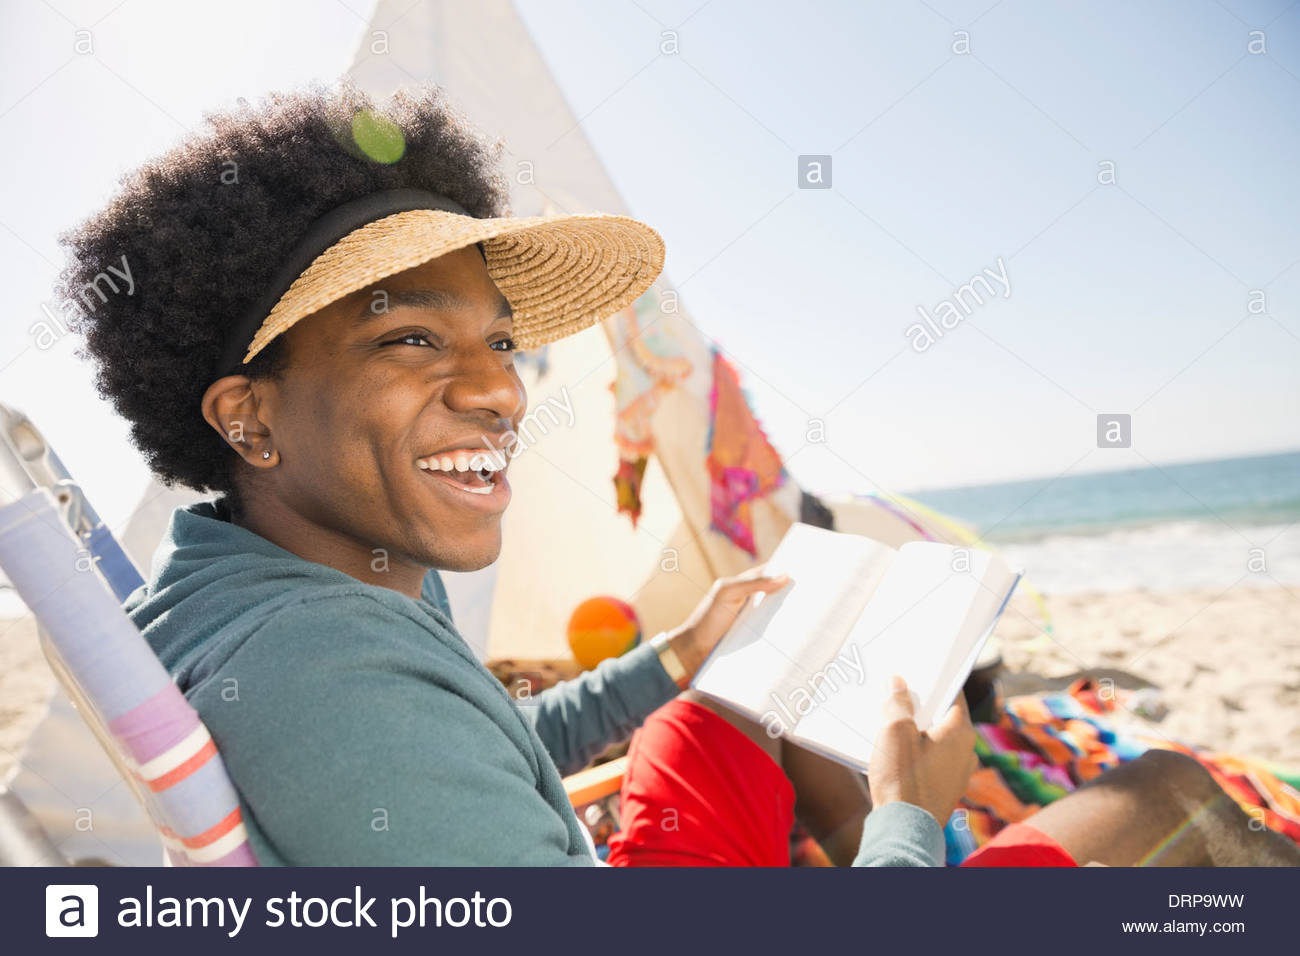 Cheerful man reading book on beach Photo Stock